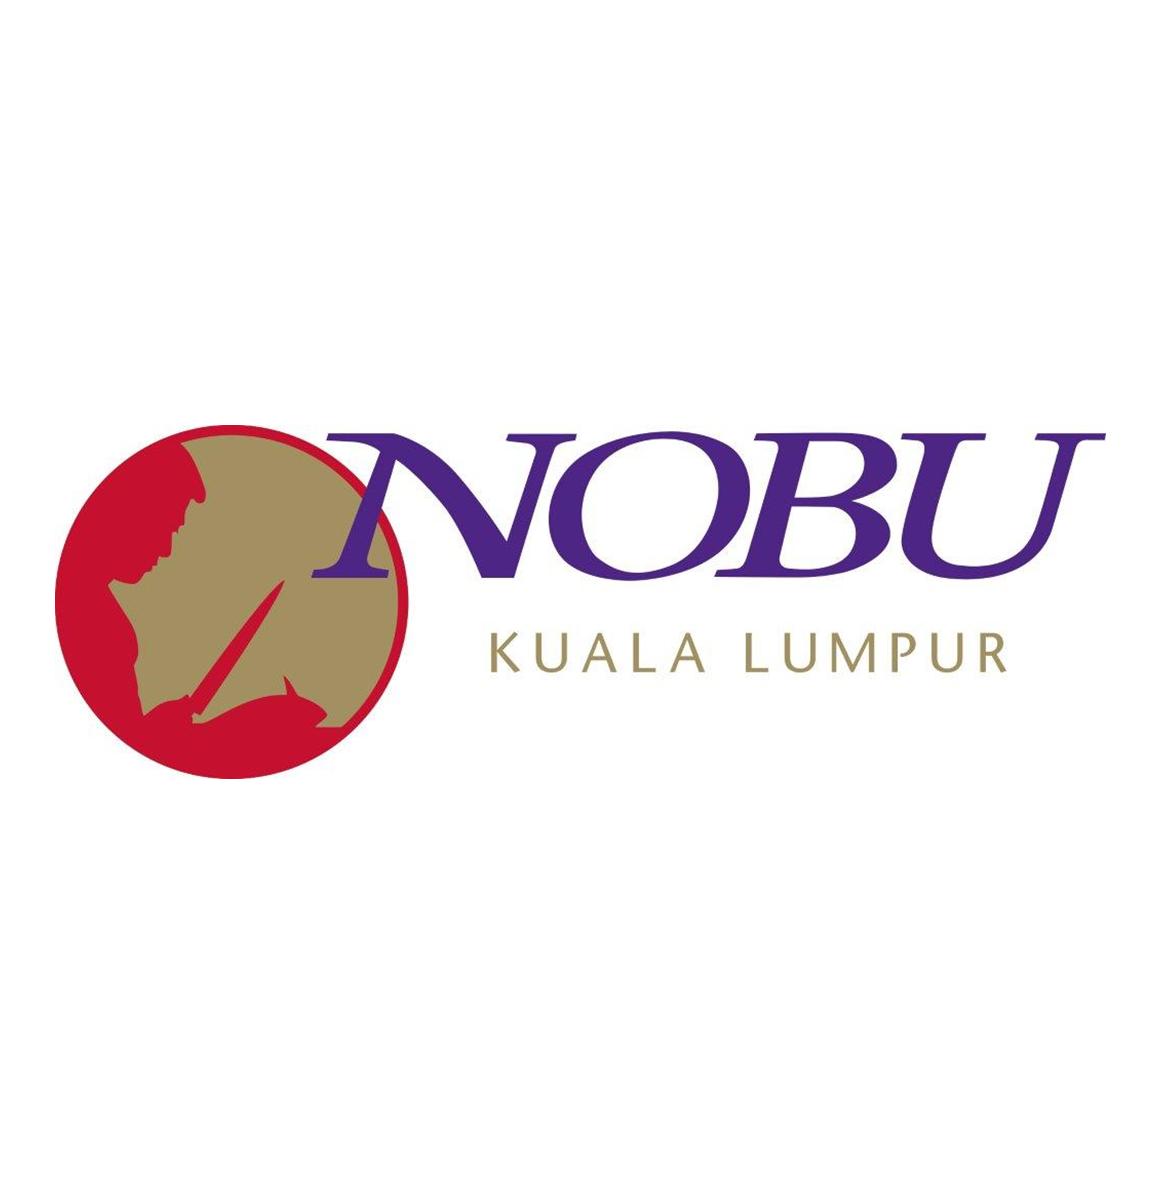 NOBU Kuala Lumpur logo